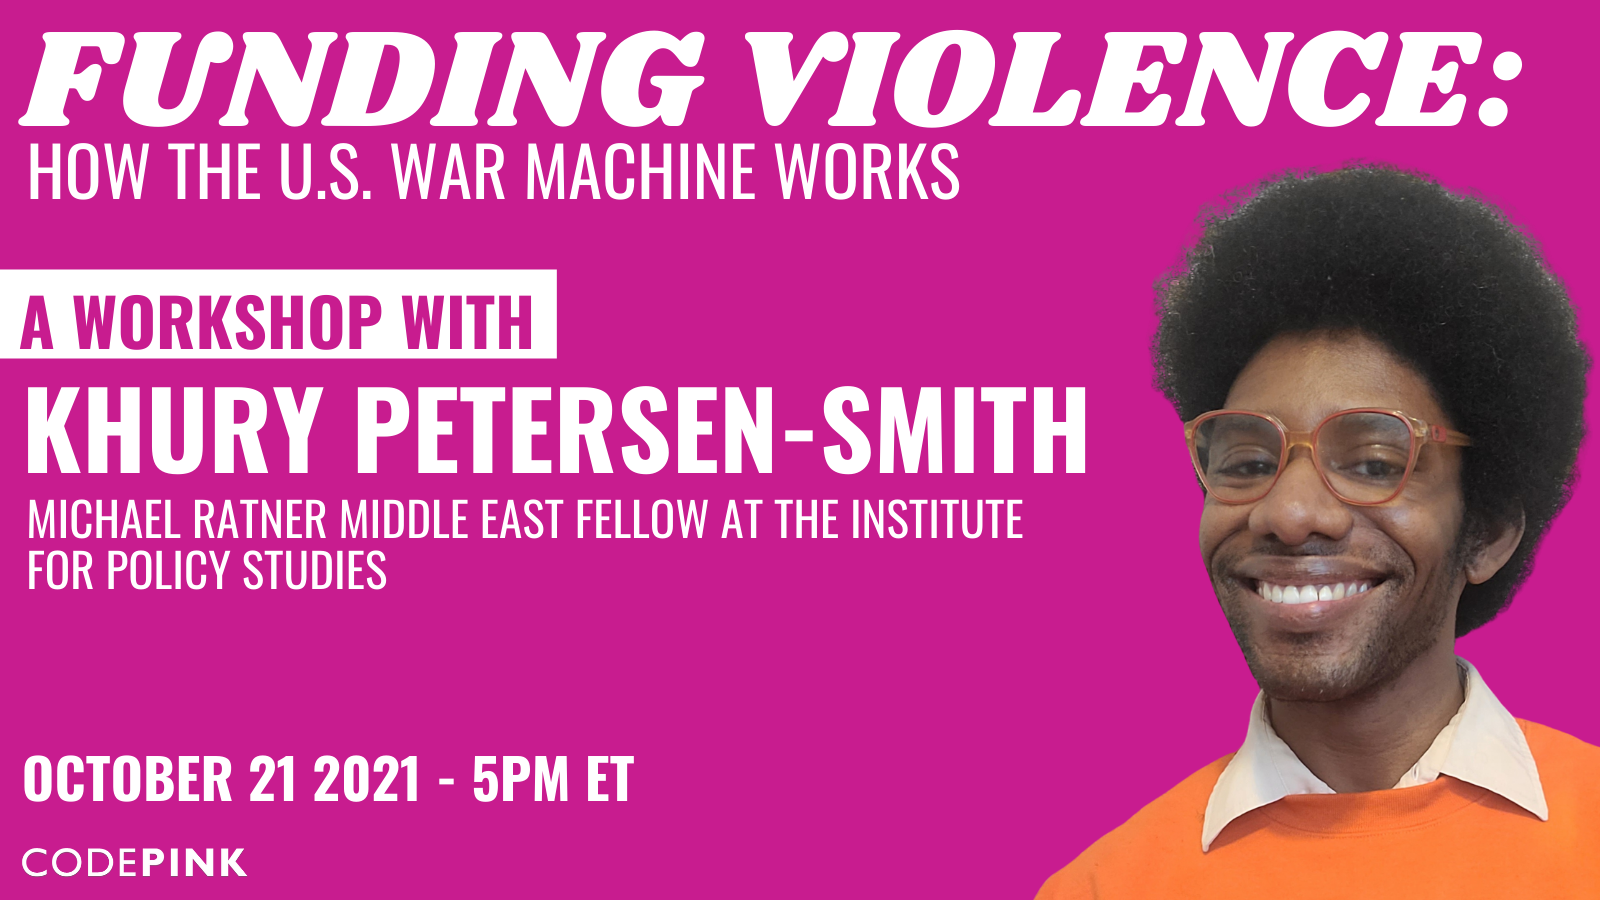 Funding Violence: How the U.S. War Machine Works